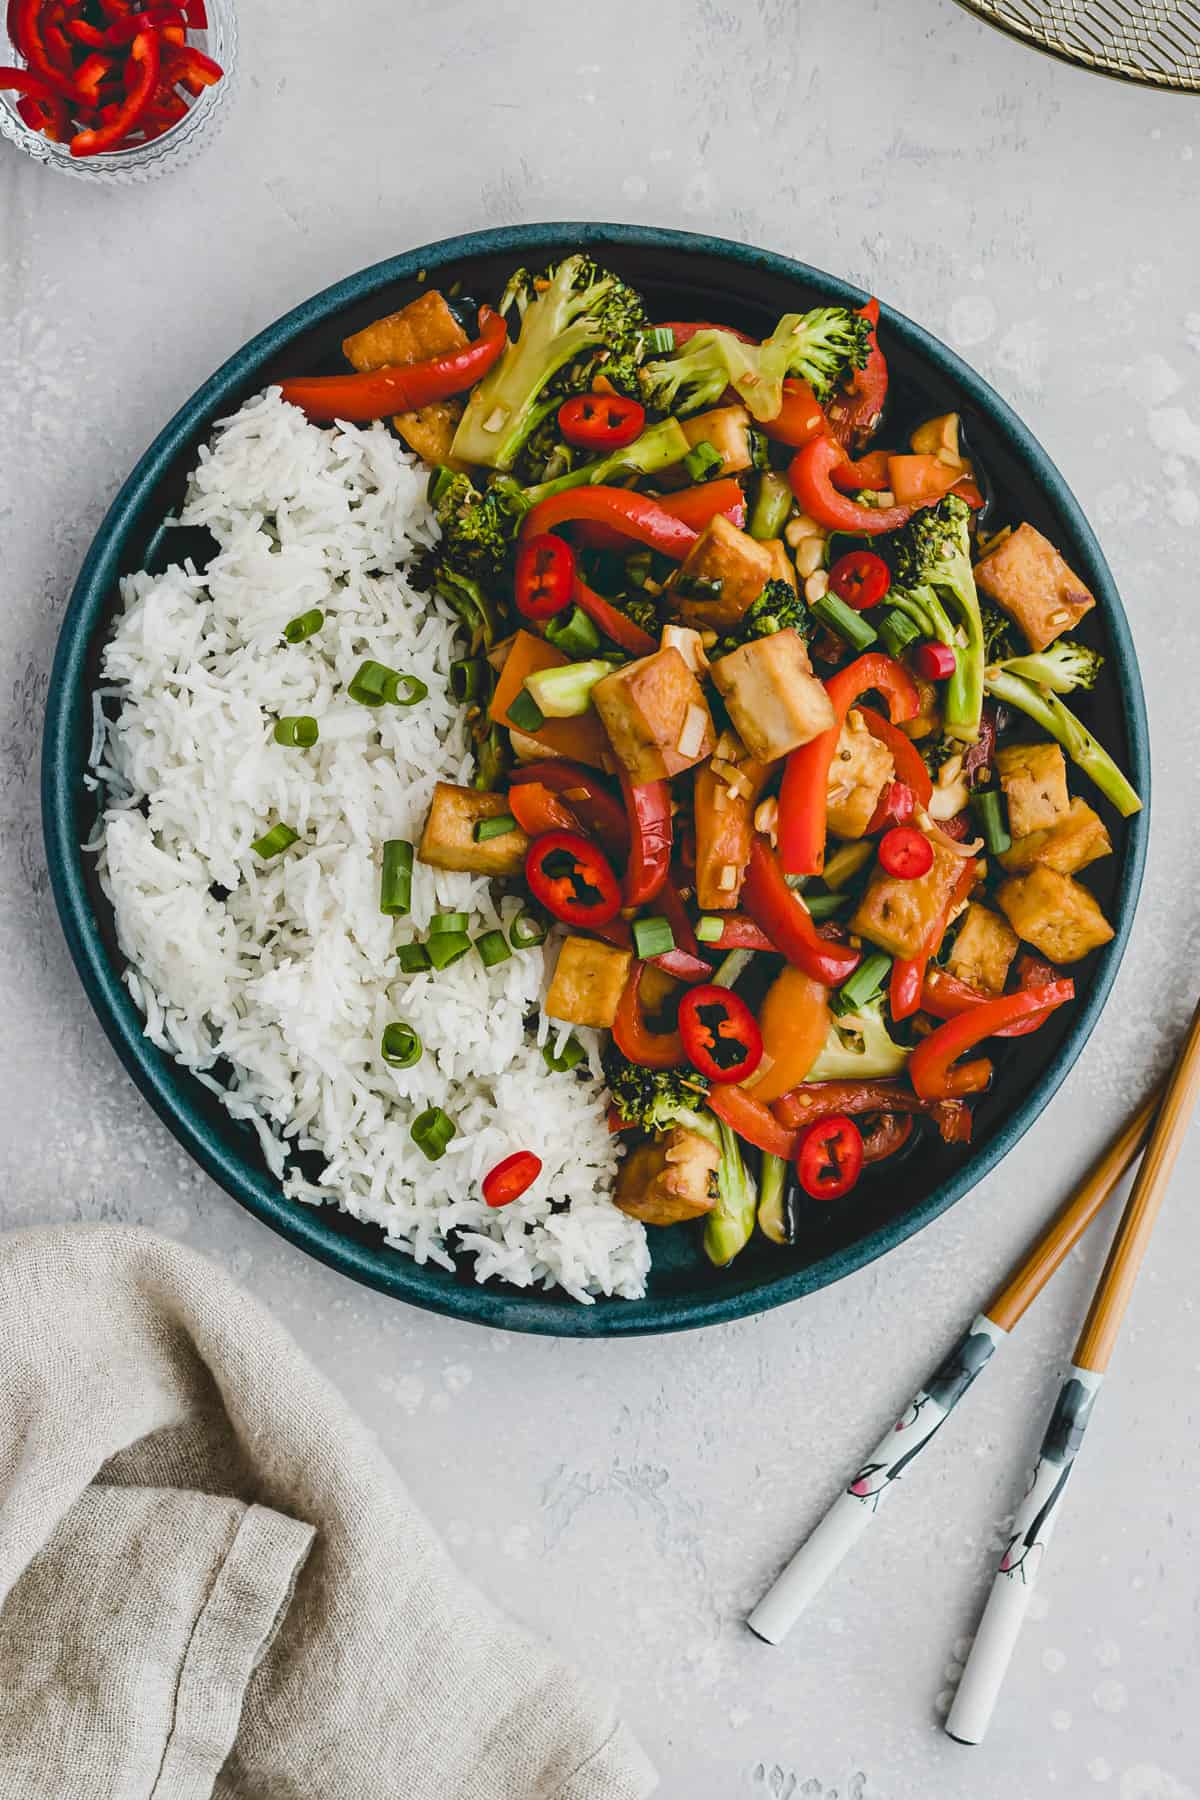 tofu veggie stir fry on a blue plate